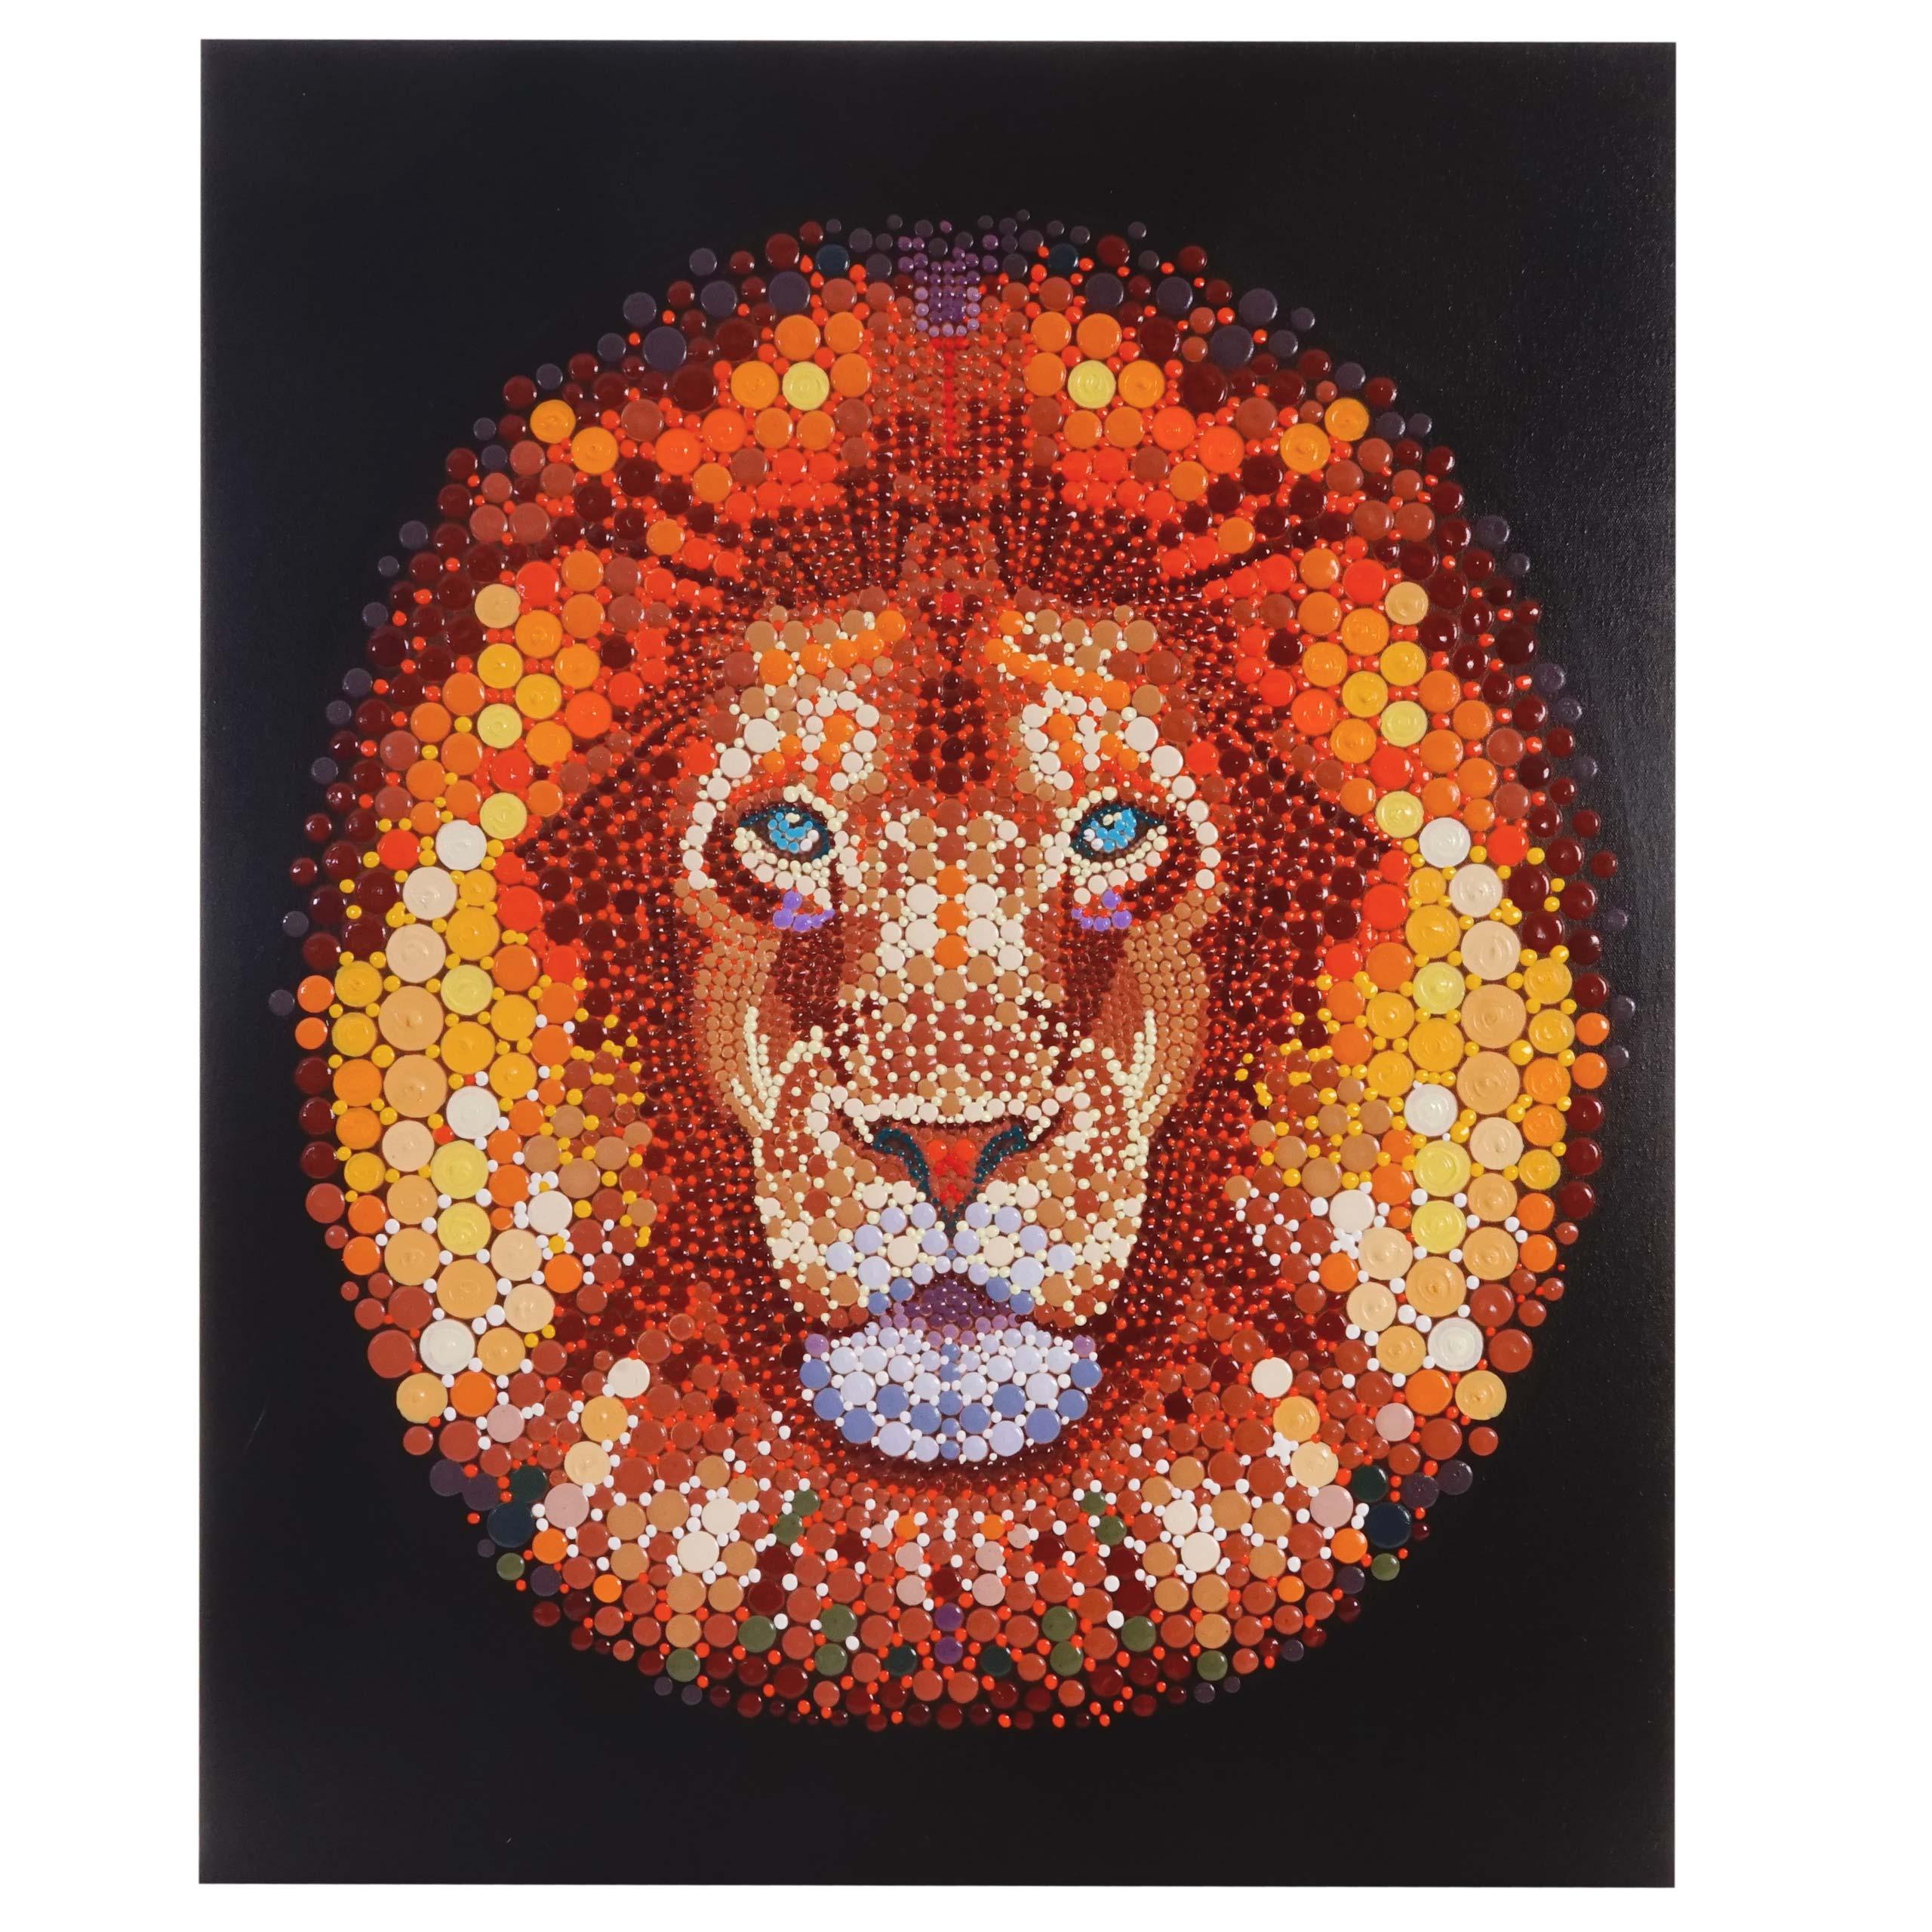 Mendler Ölgemälde Löwe, 100% handgemaltes Wandbild Gemälde XL, 100x80cm ~ Variantenangebot 44720